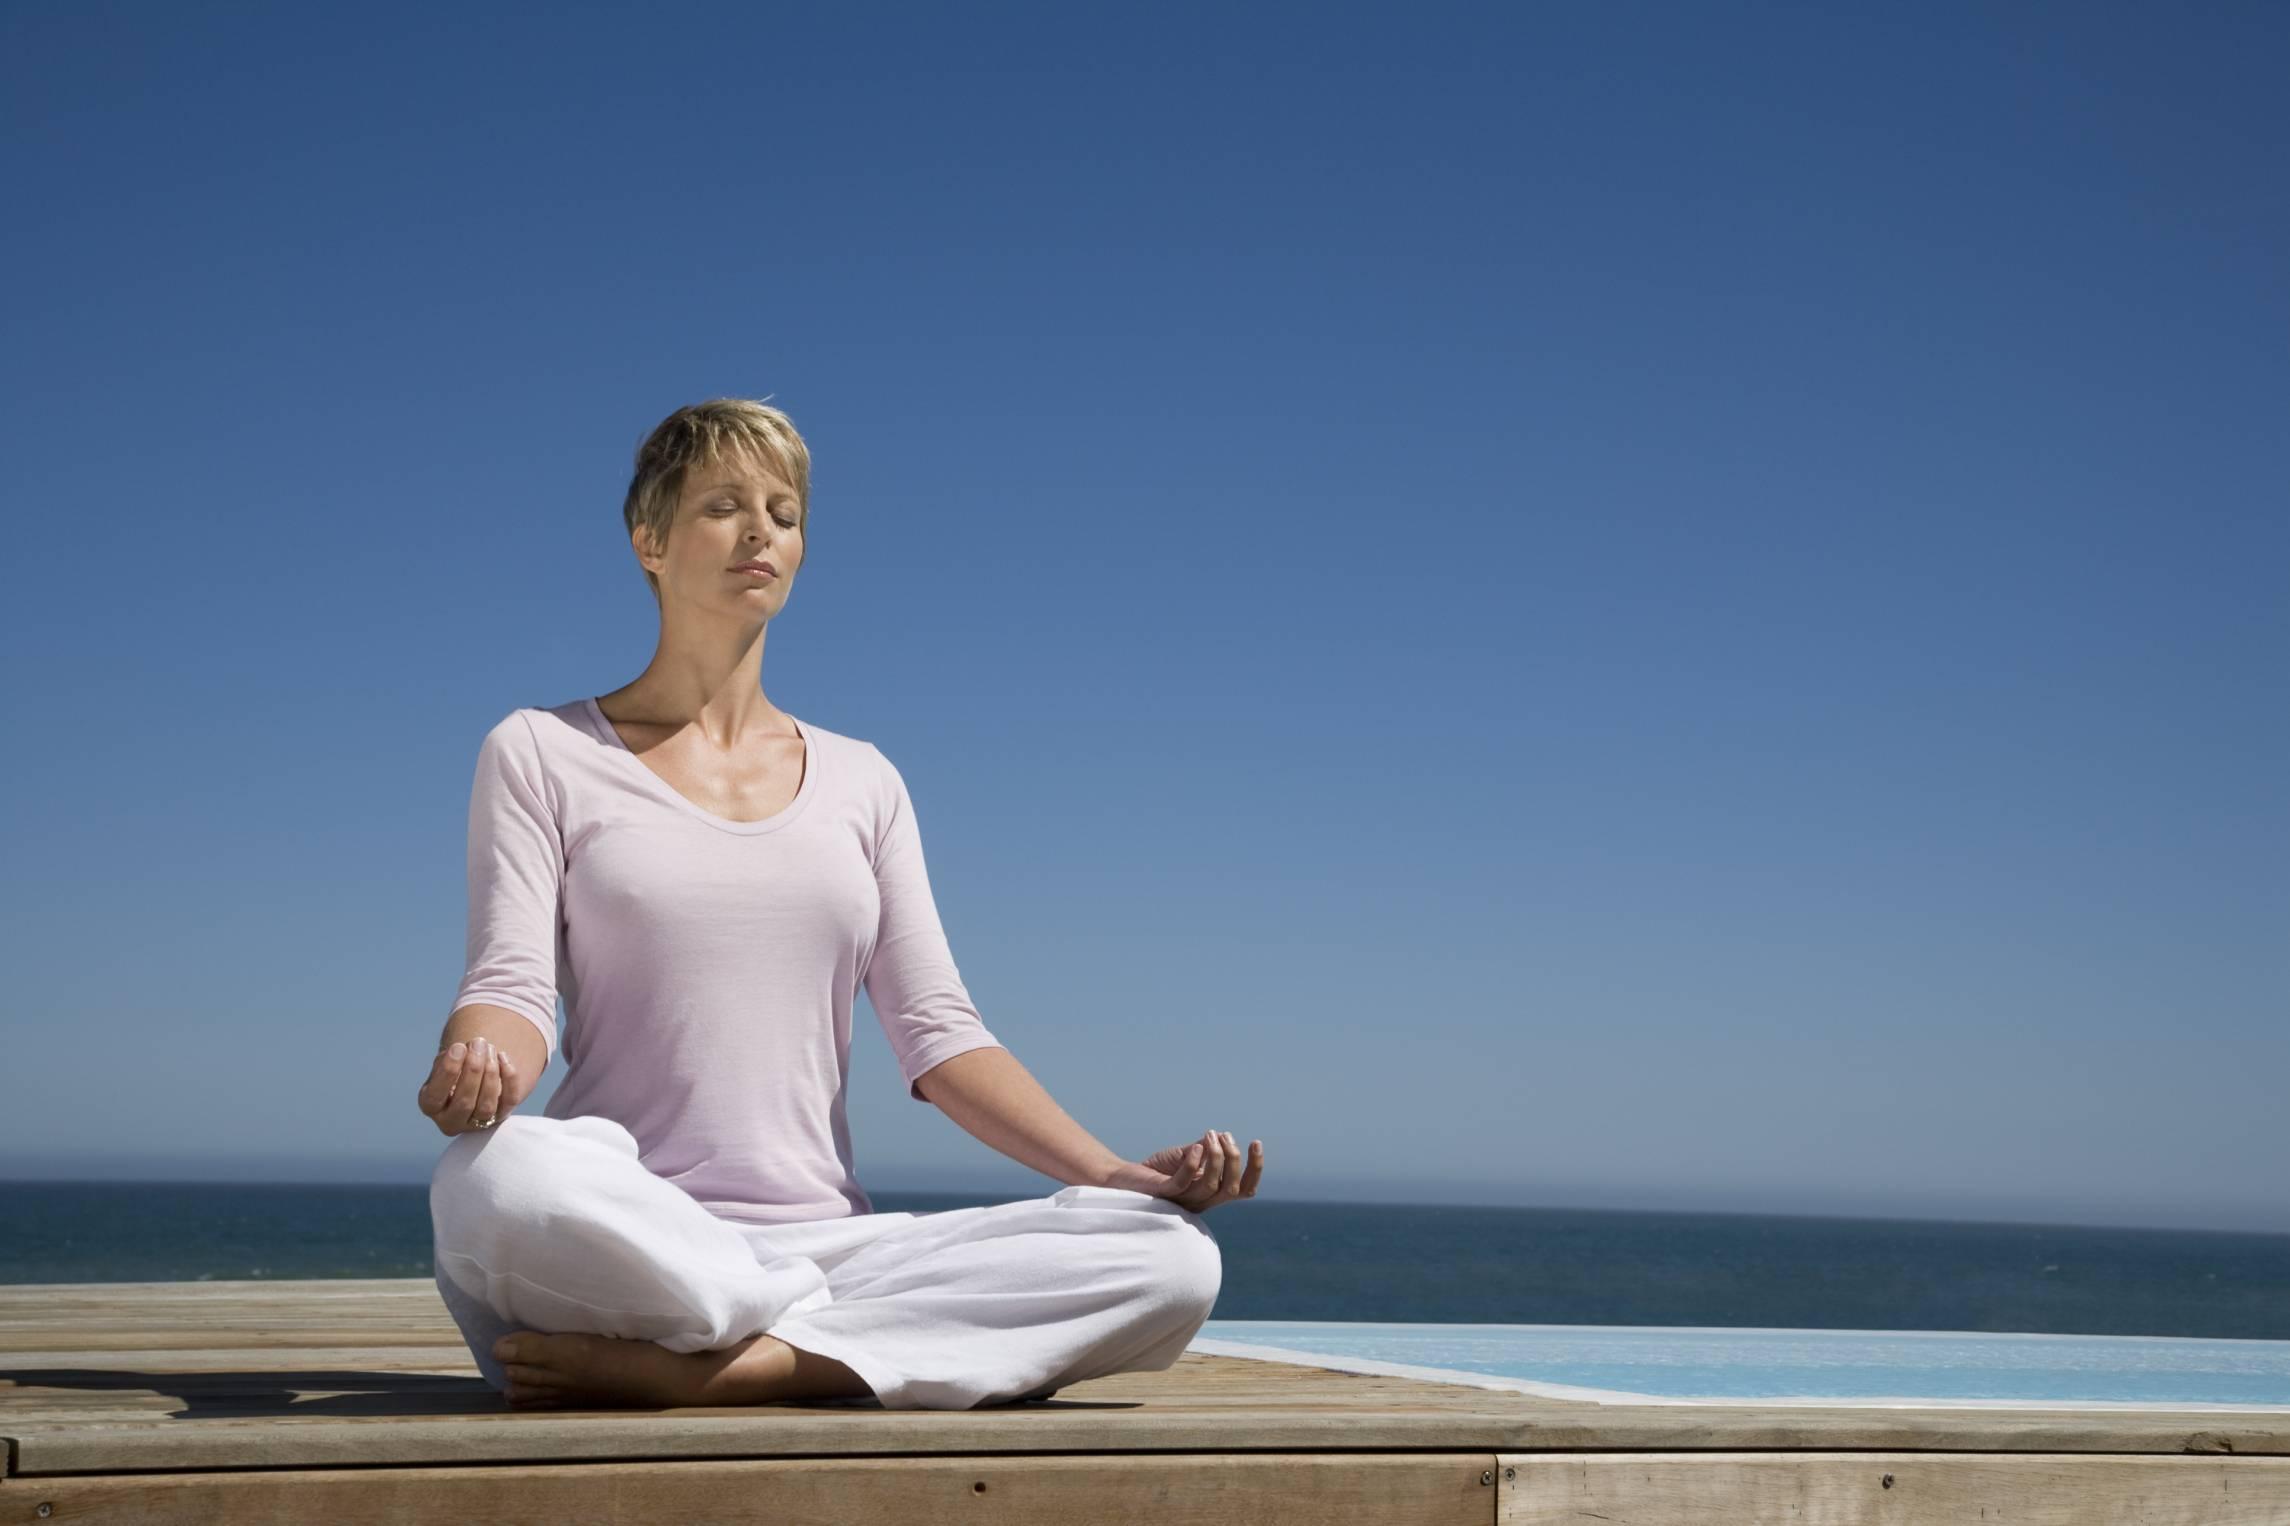 Медитация хоопонопоно | магия в нас и вокруг нас вики | fandom